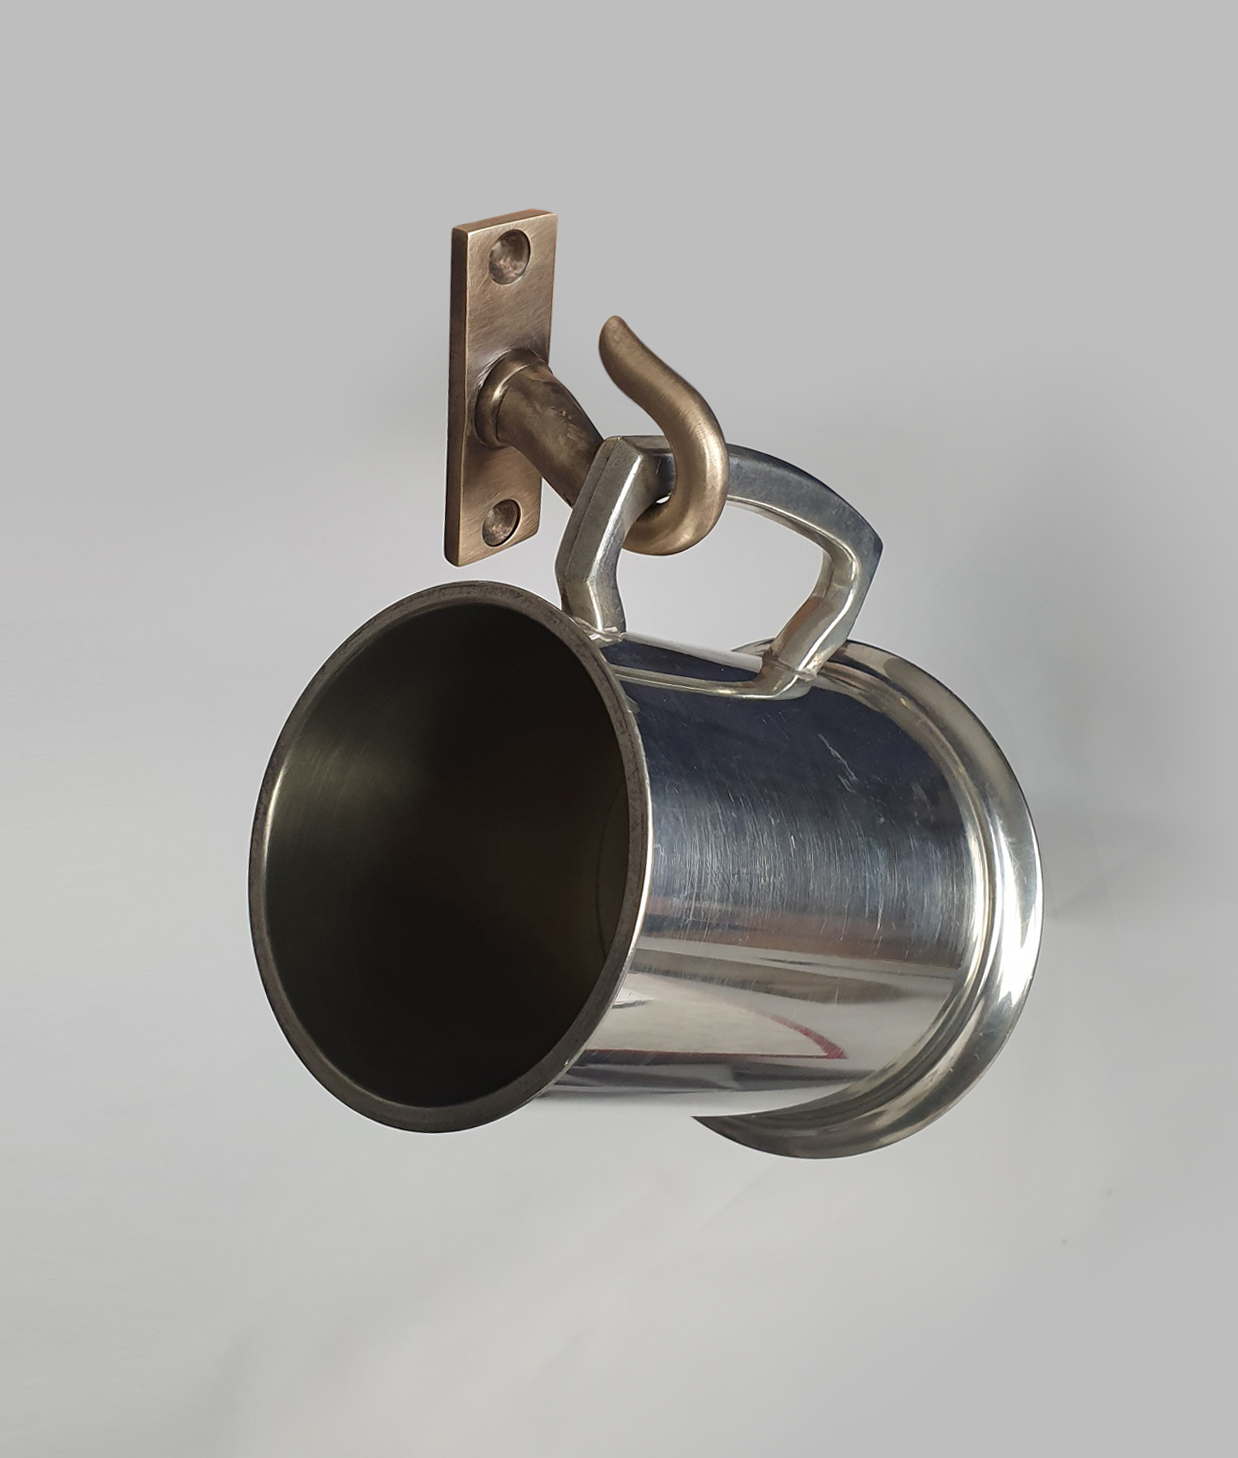 Mug Hooks